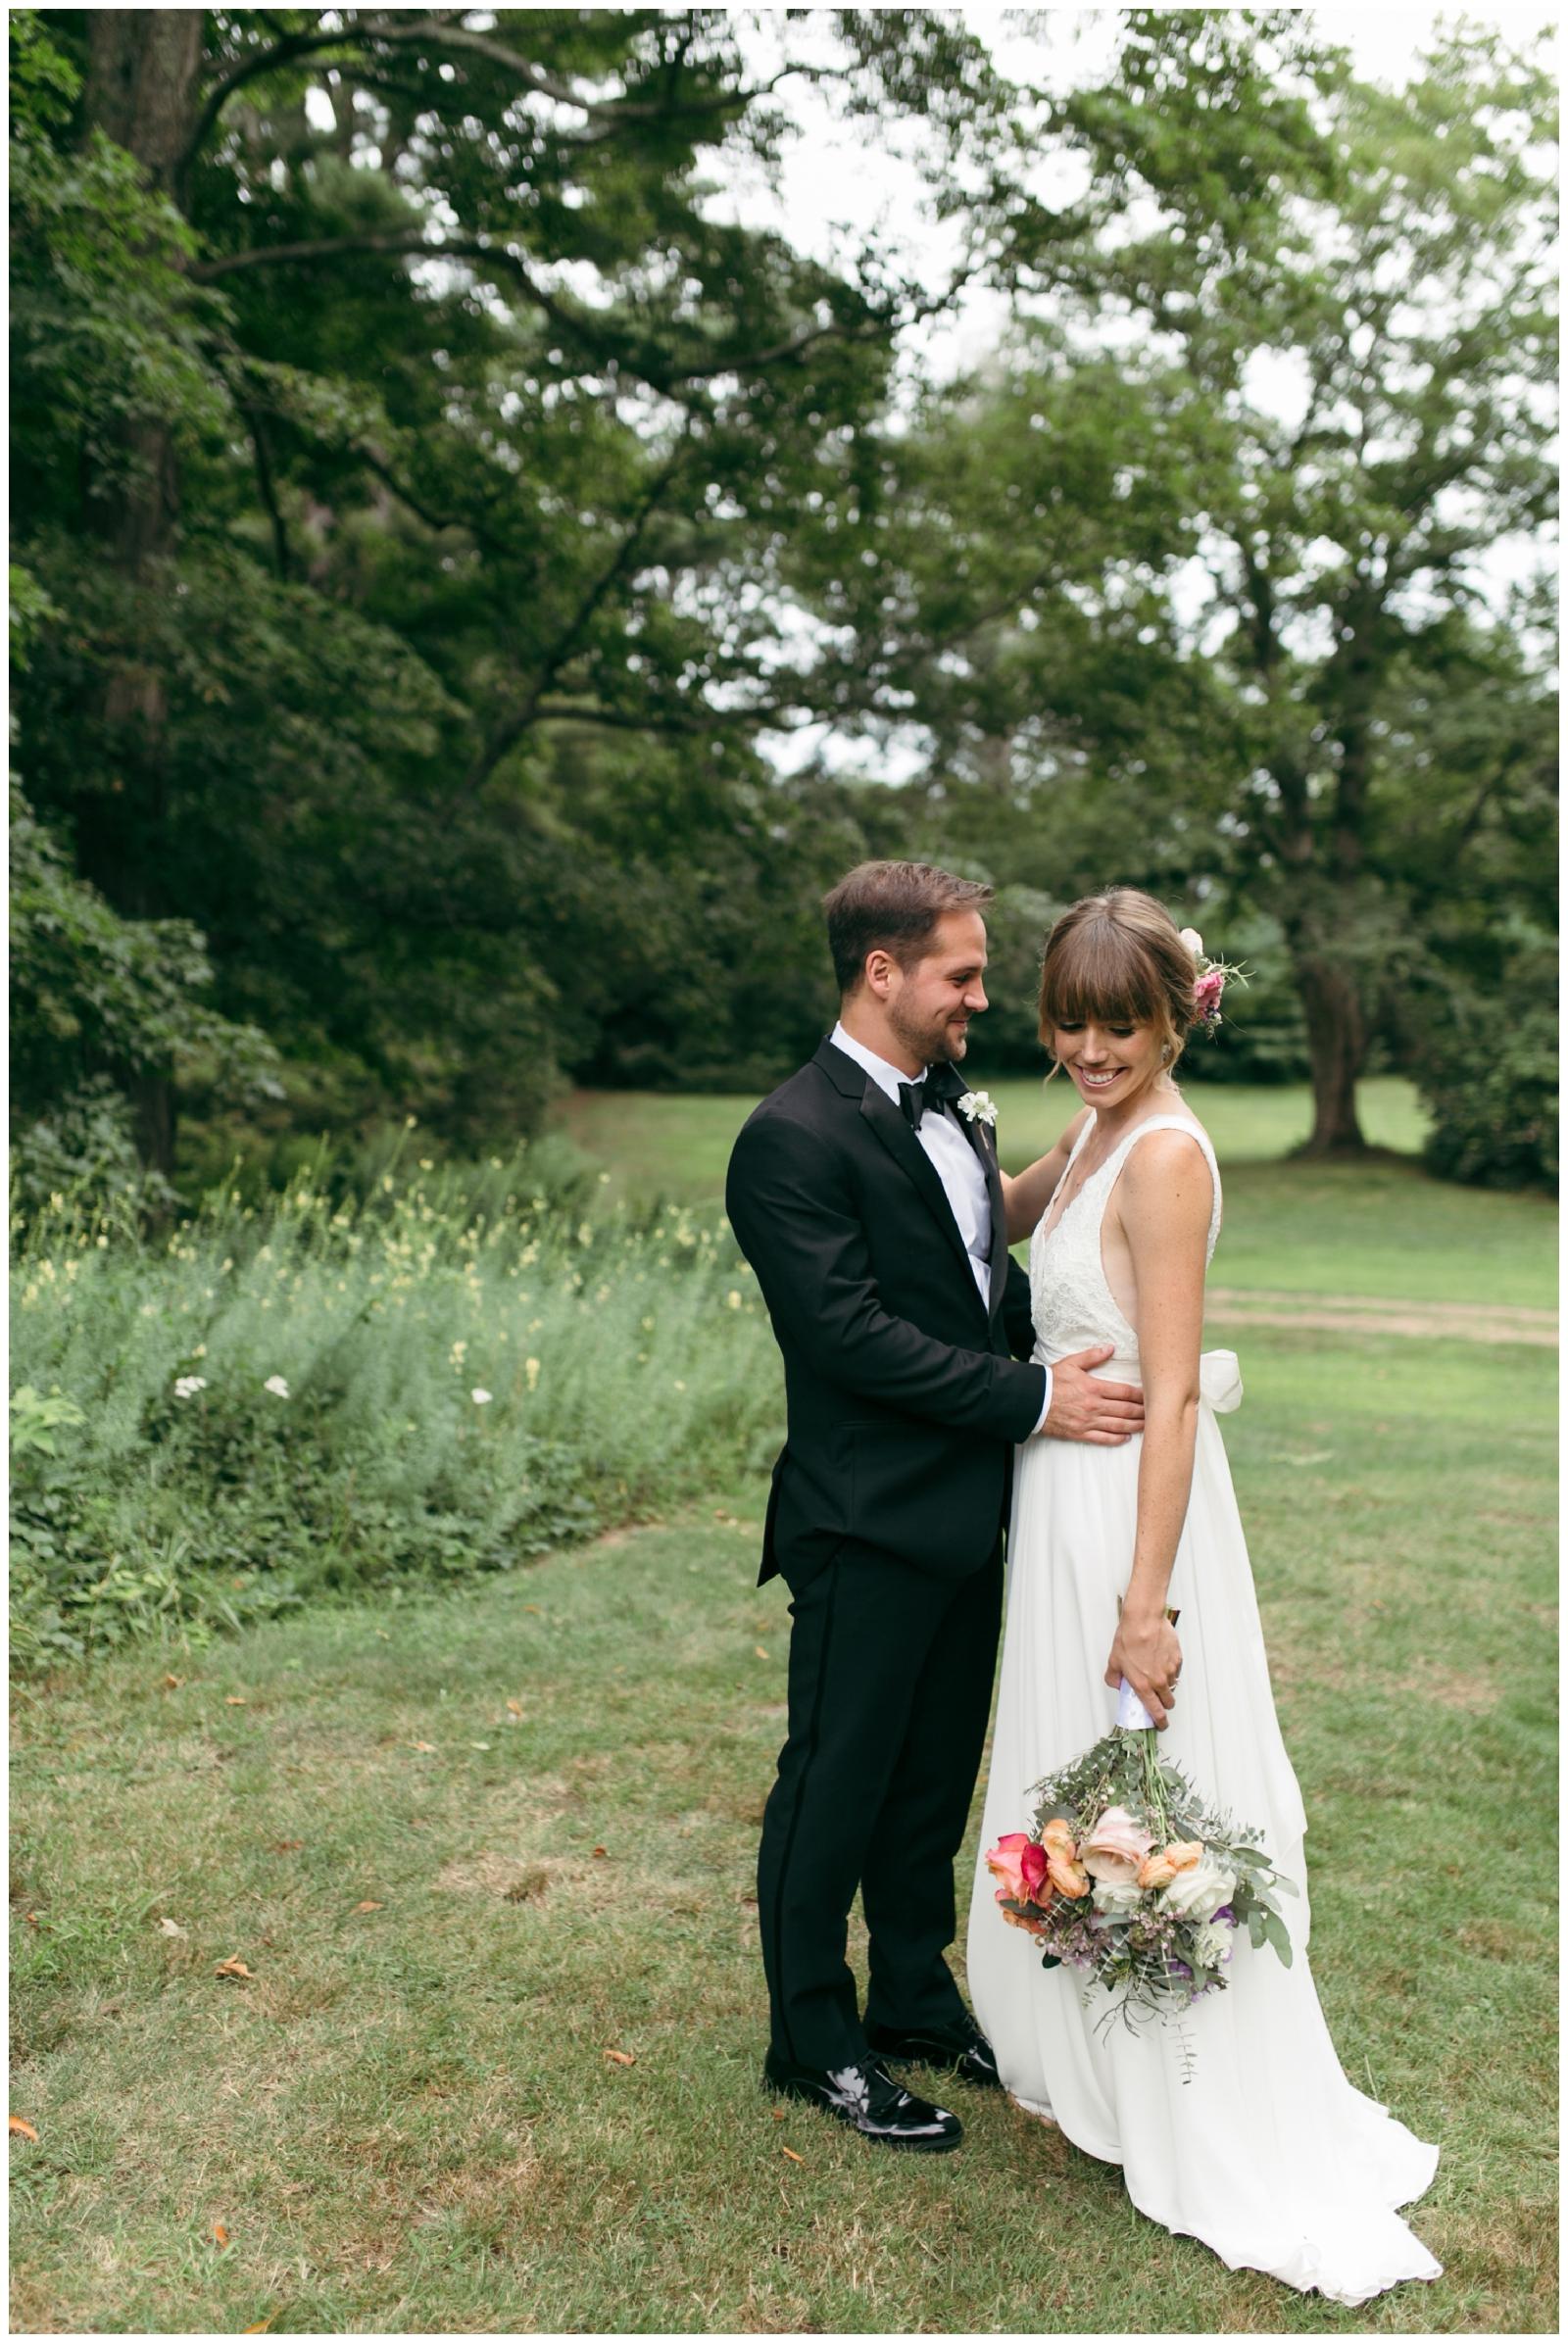 Moraine-Farm-wedding-Bailey-Q-Photo-Massachusetts-wedding-photpgrapher-032.jpg